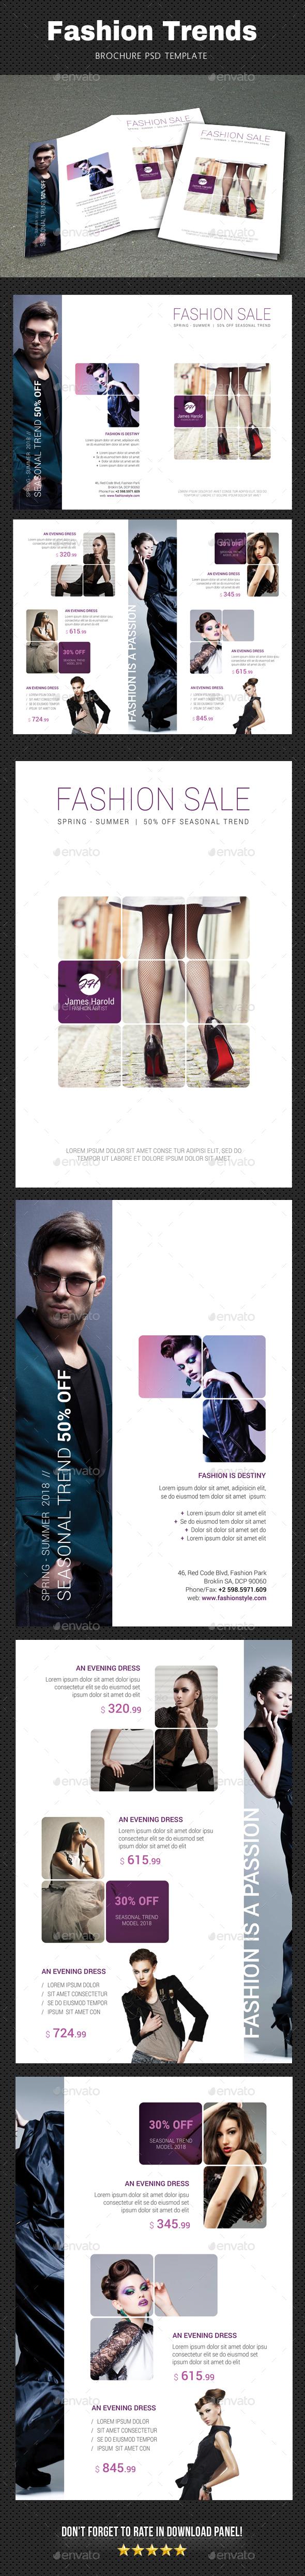 Fashion Brochure 2 - Brochures Print Templates